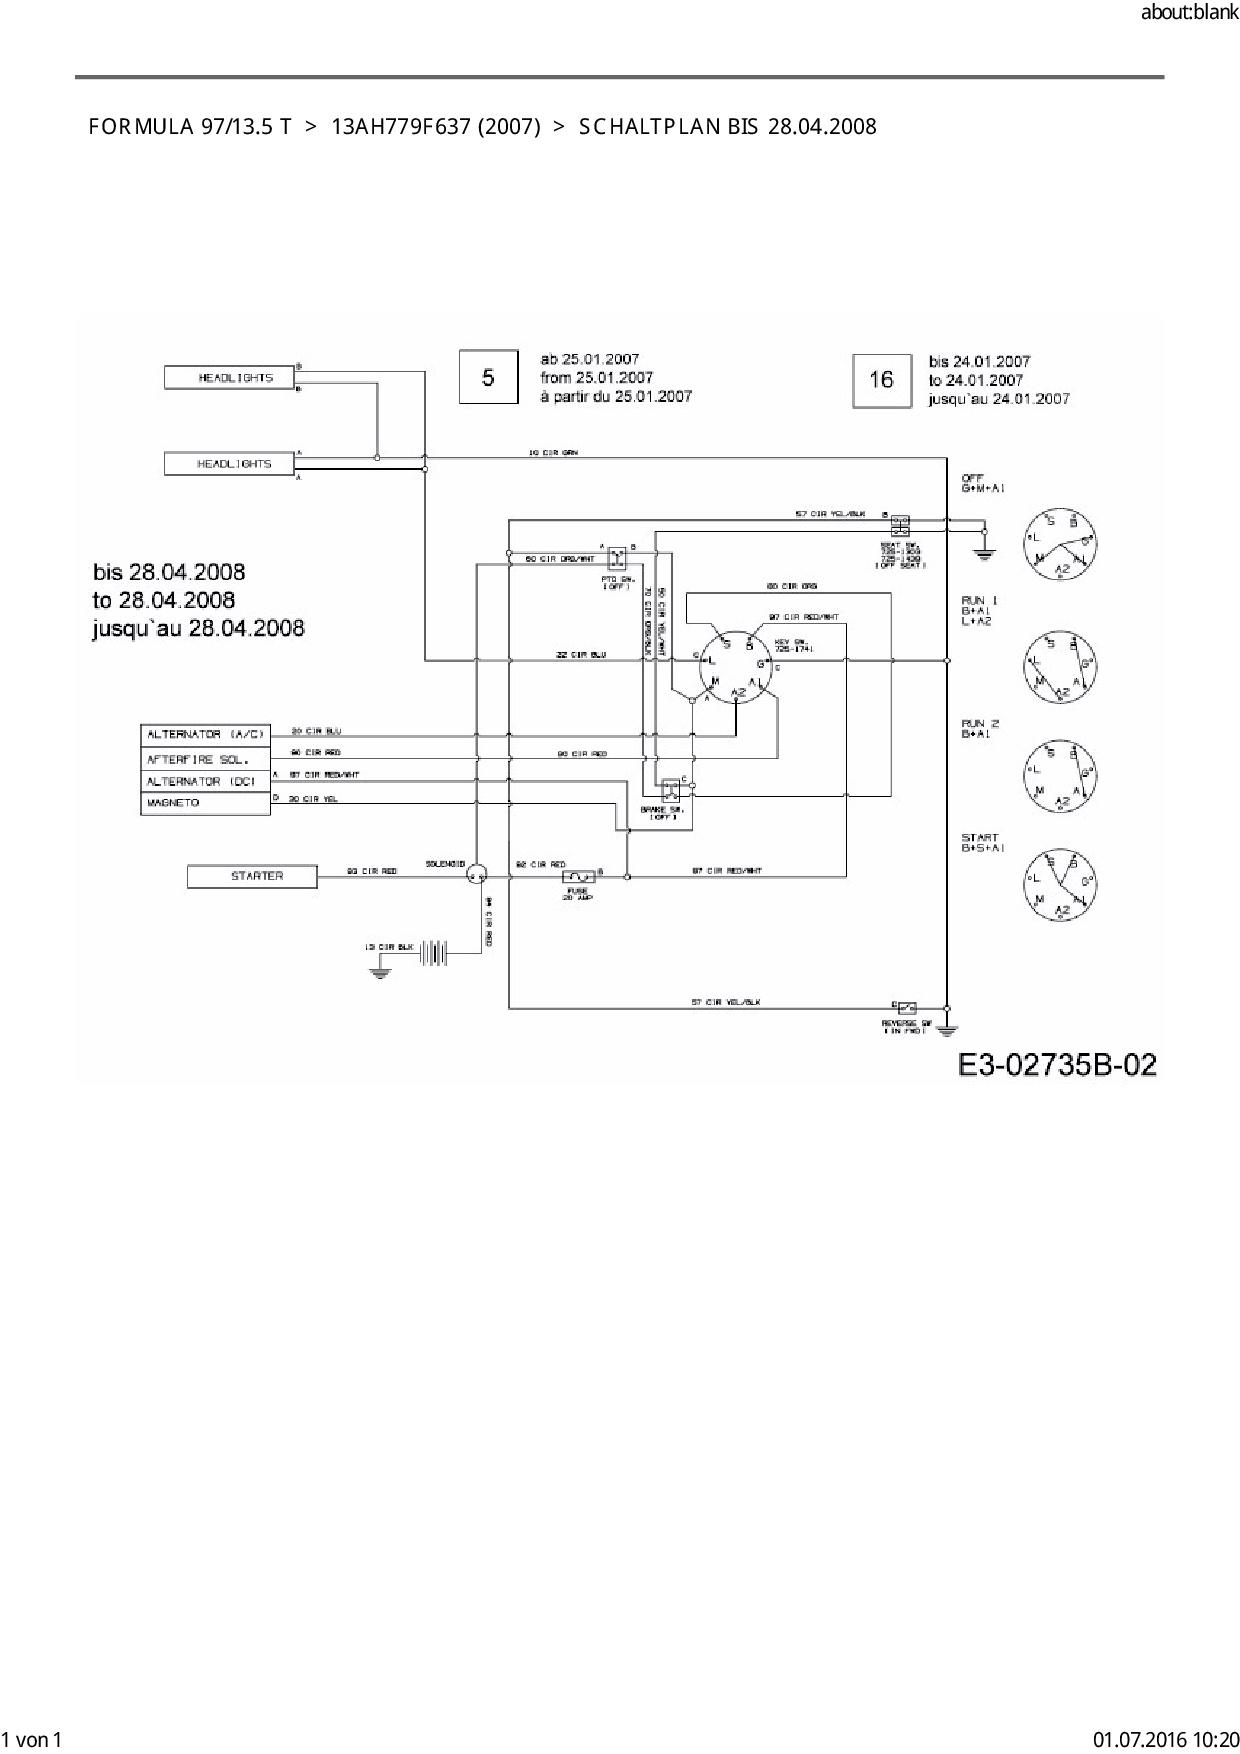 Berühmt 917270760 Handwerker Schaltplan Modell Bilder - Schaltplan ...